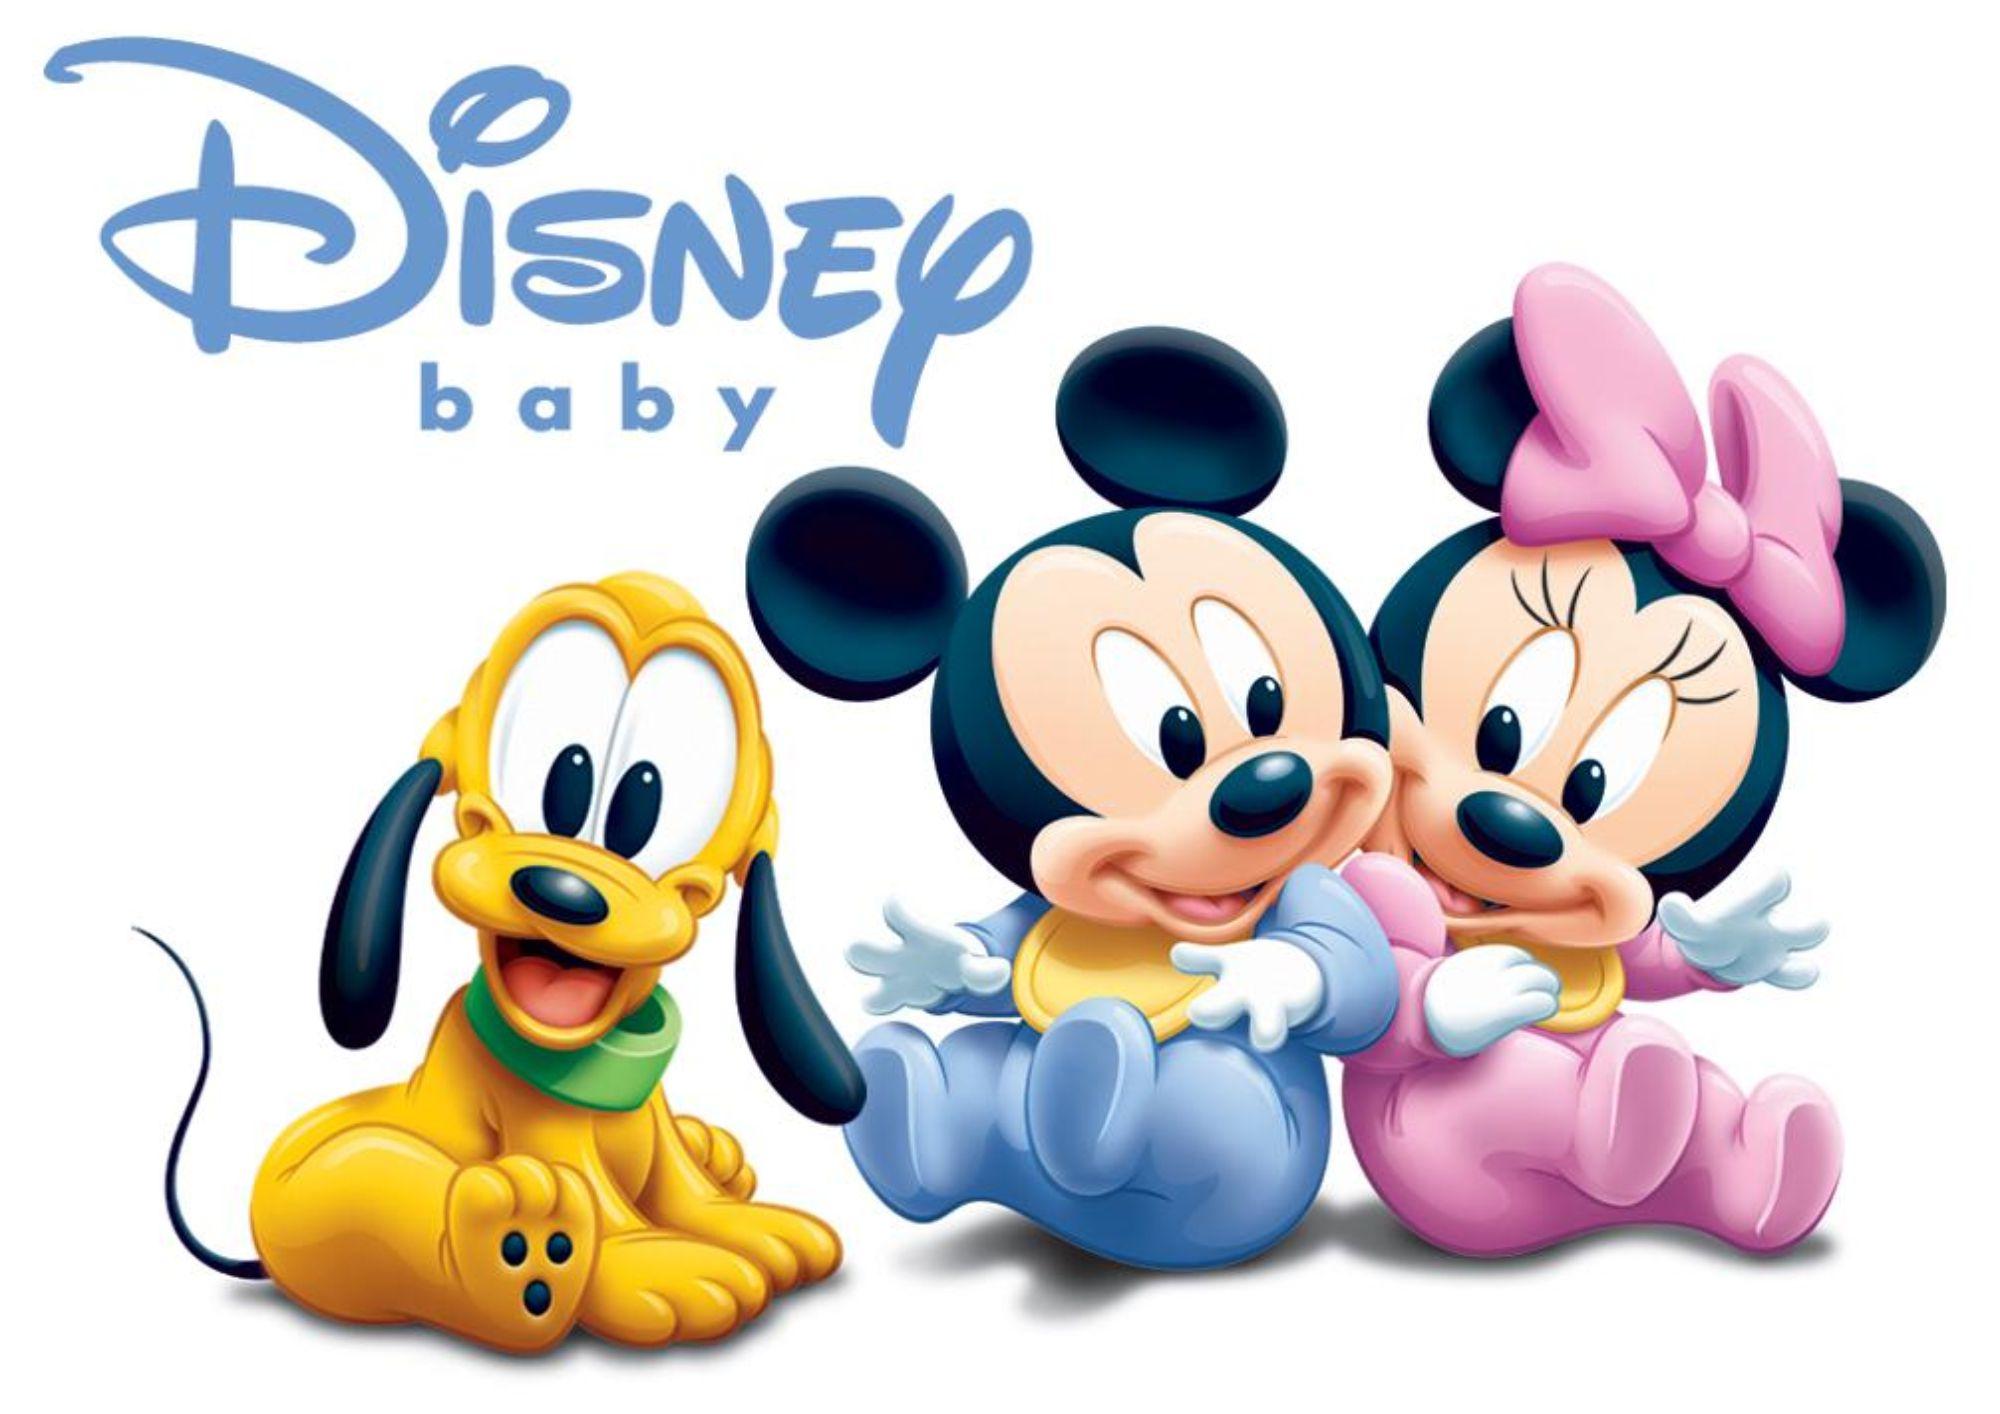 Poster Cartaz Mickey Minnie Pluto Disney Baby No Elo7 Ashow